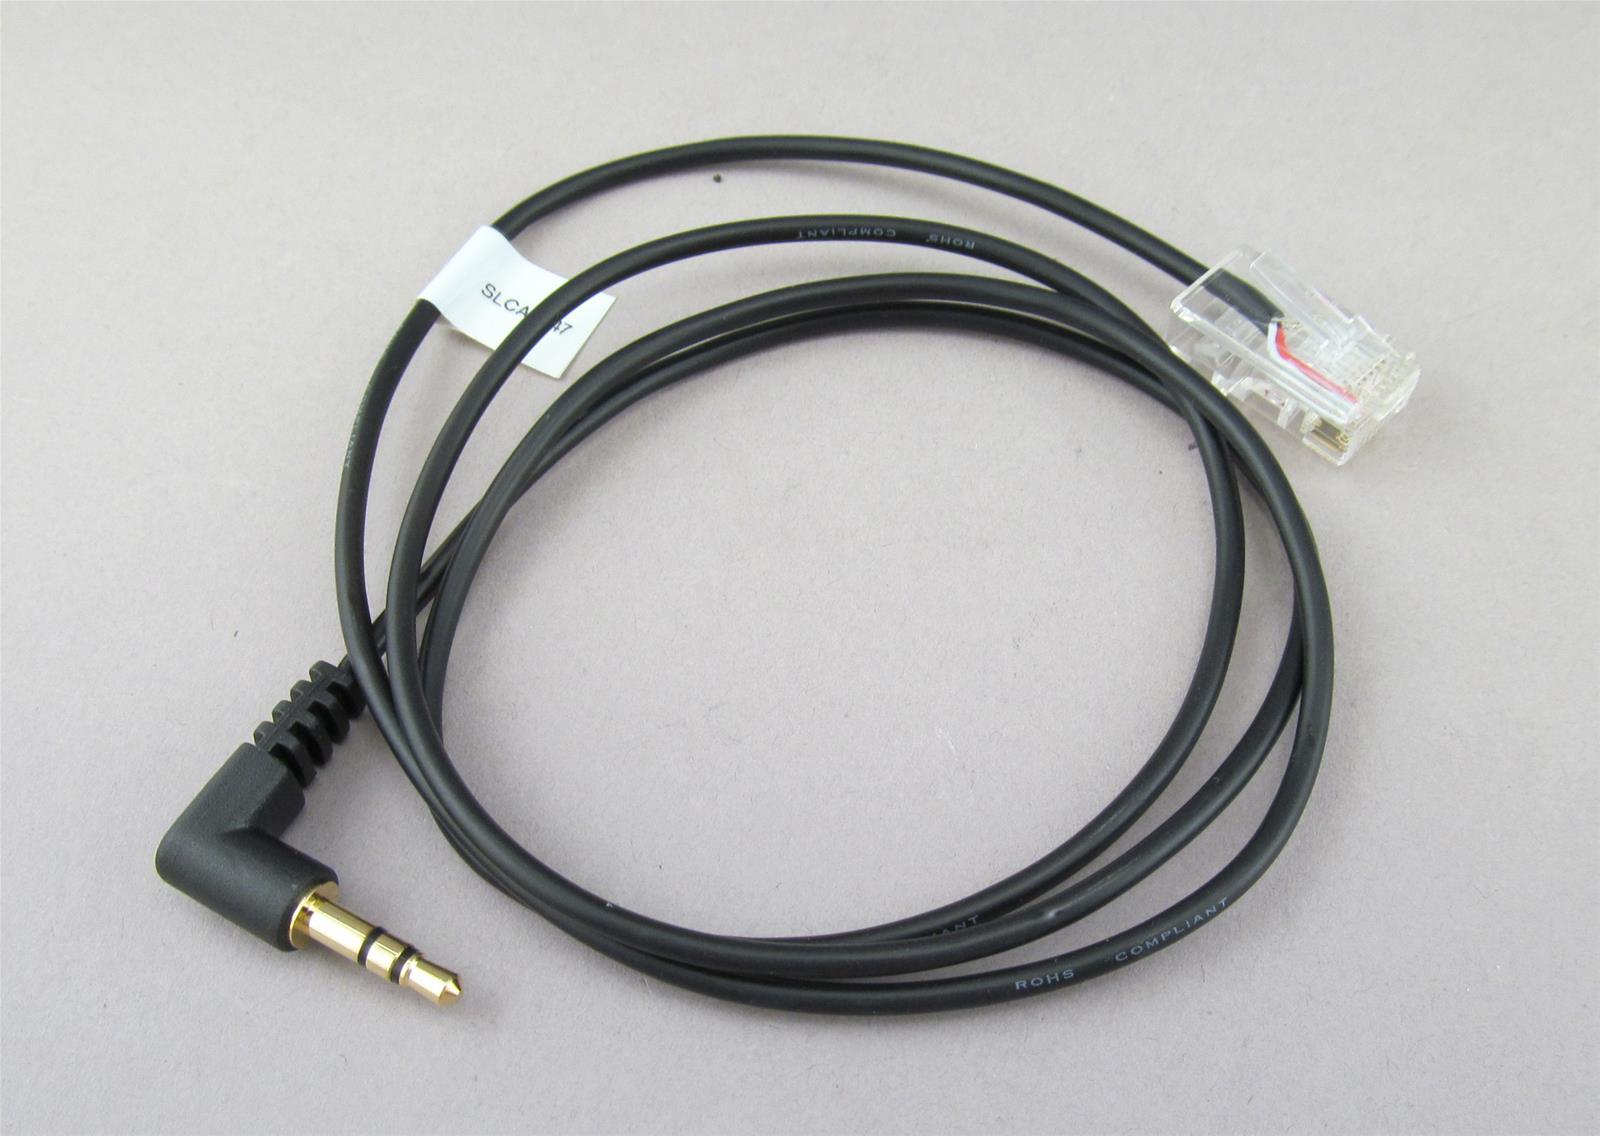 Tigertronics SignaLink™ Radio Interface Cables SL-CAB847